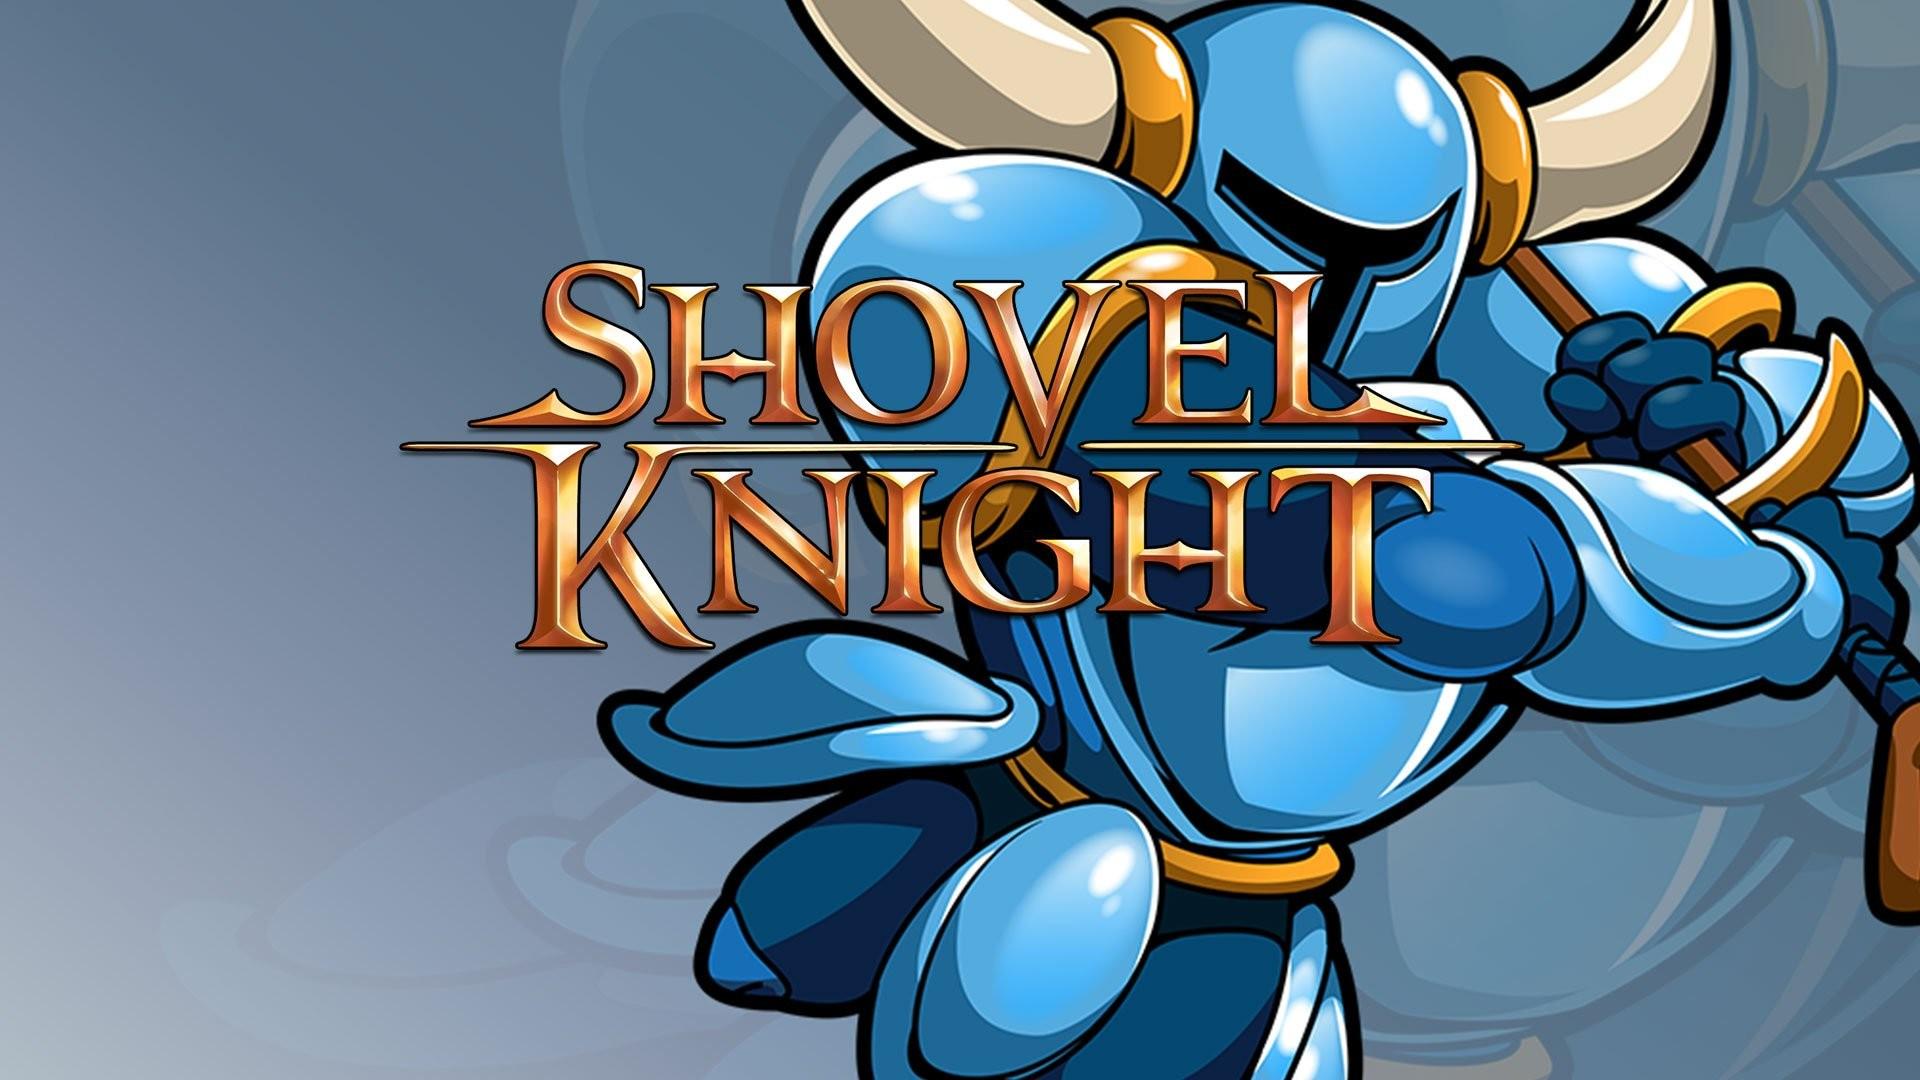 SHOVEL KNIGHT action adventure fighting warrior scrolling platform 1shov  wallpaper | | 635717 | WallpaperUP